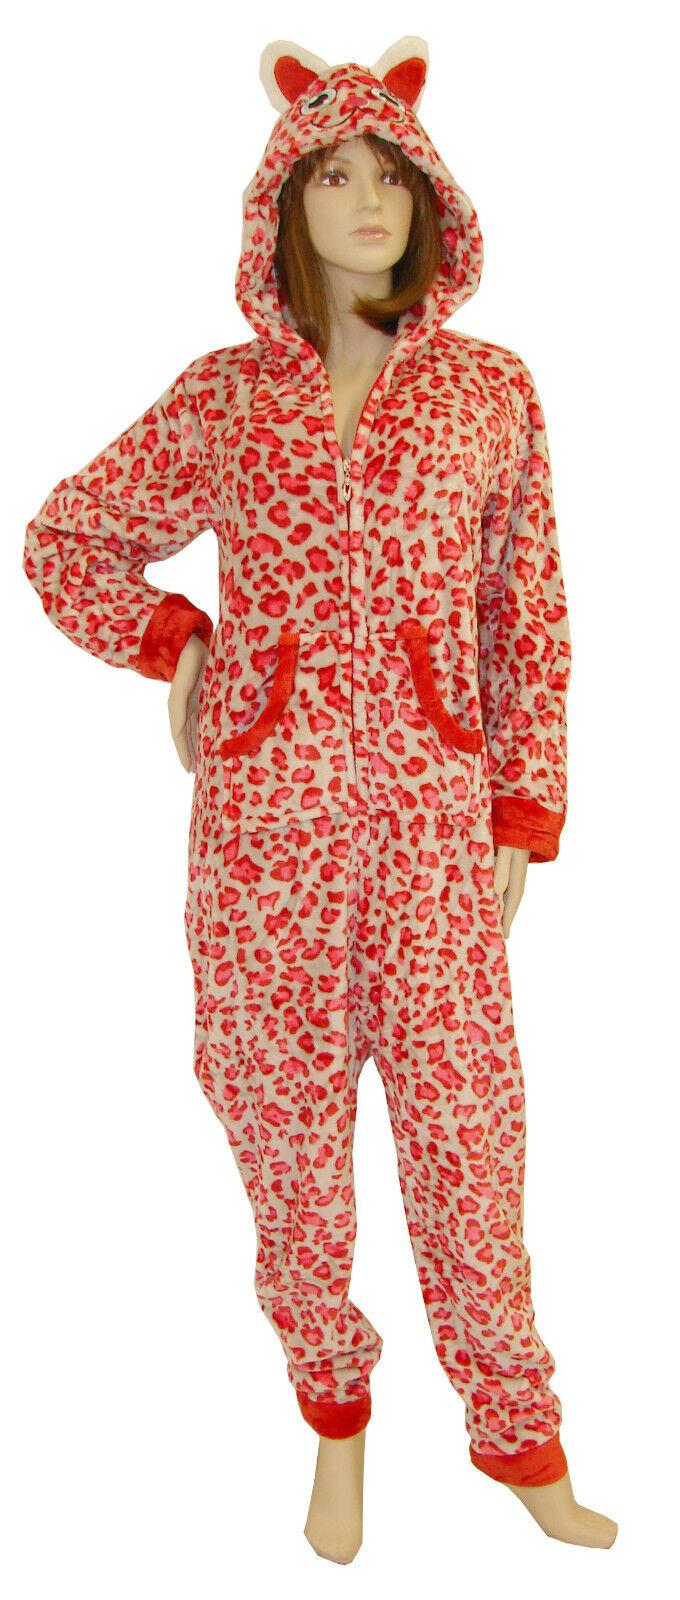 SEXY Pigiama ORSO peluche Tuta Tutina intera women Unisex costume Macolato red